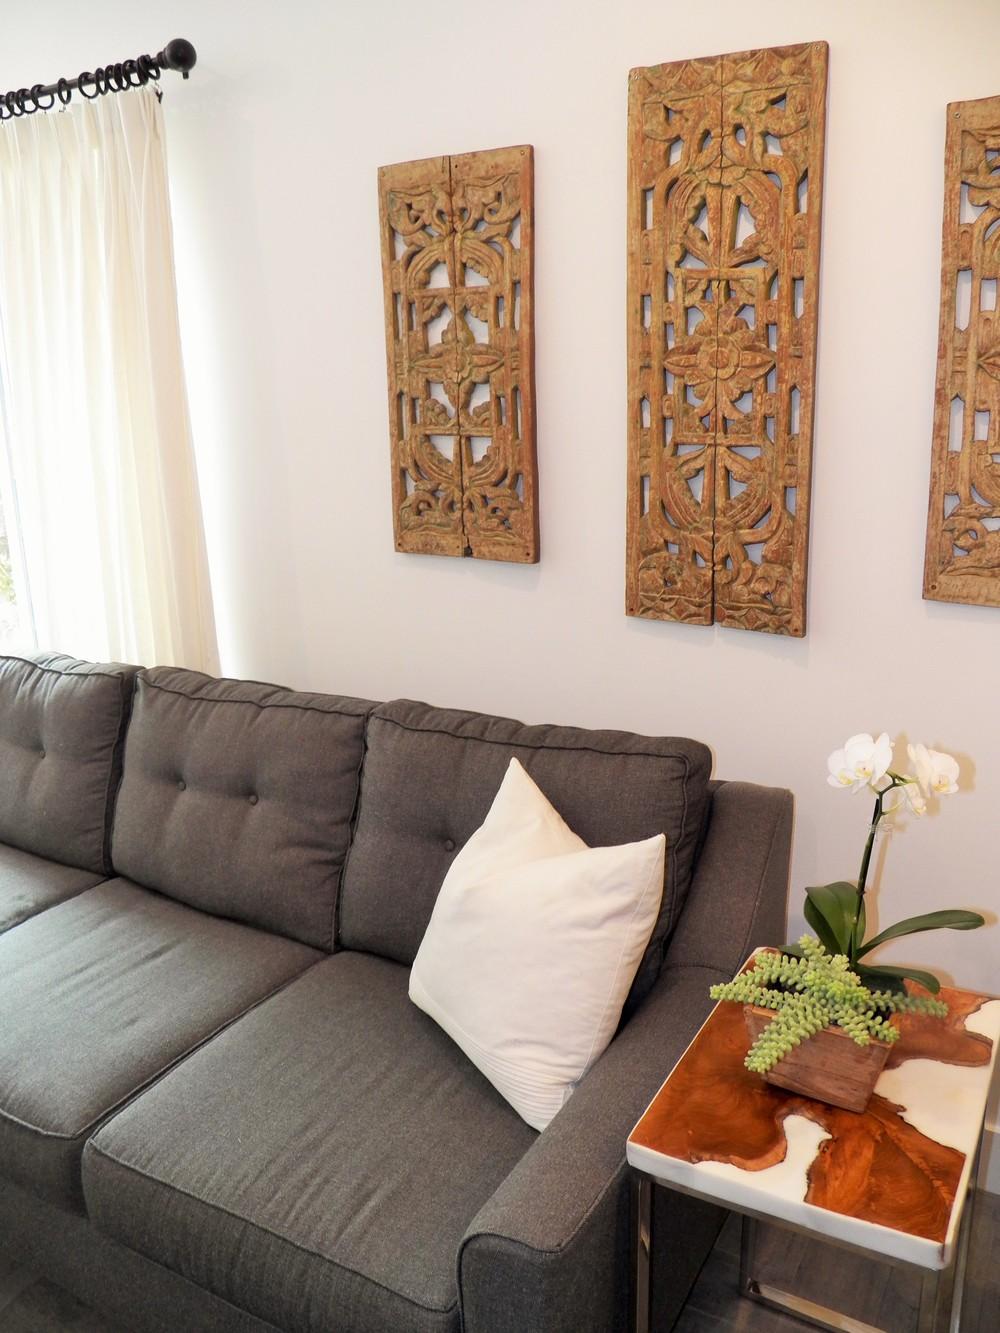 Colleen-Torres_Interior-Design-Concepts_ Monarch Beach-002.JPG